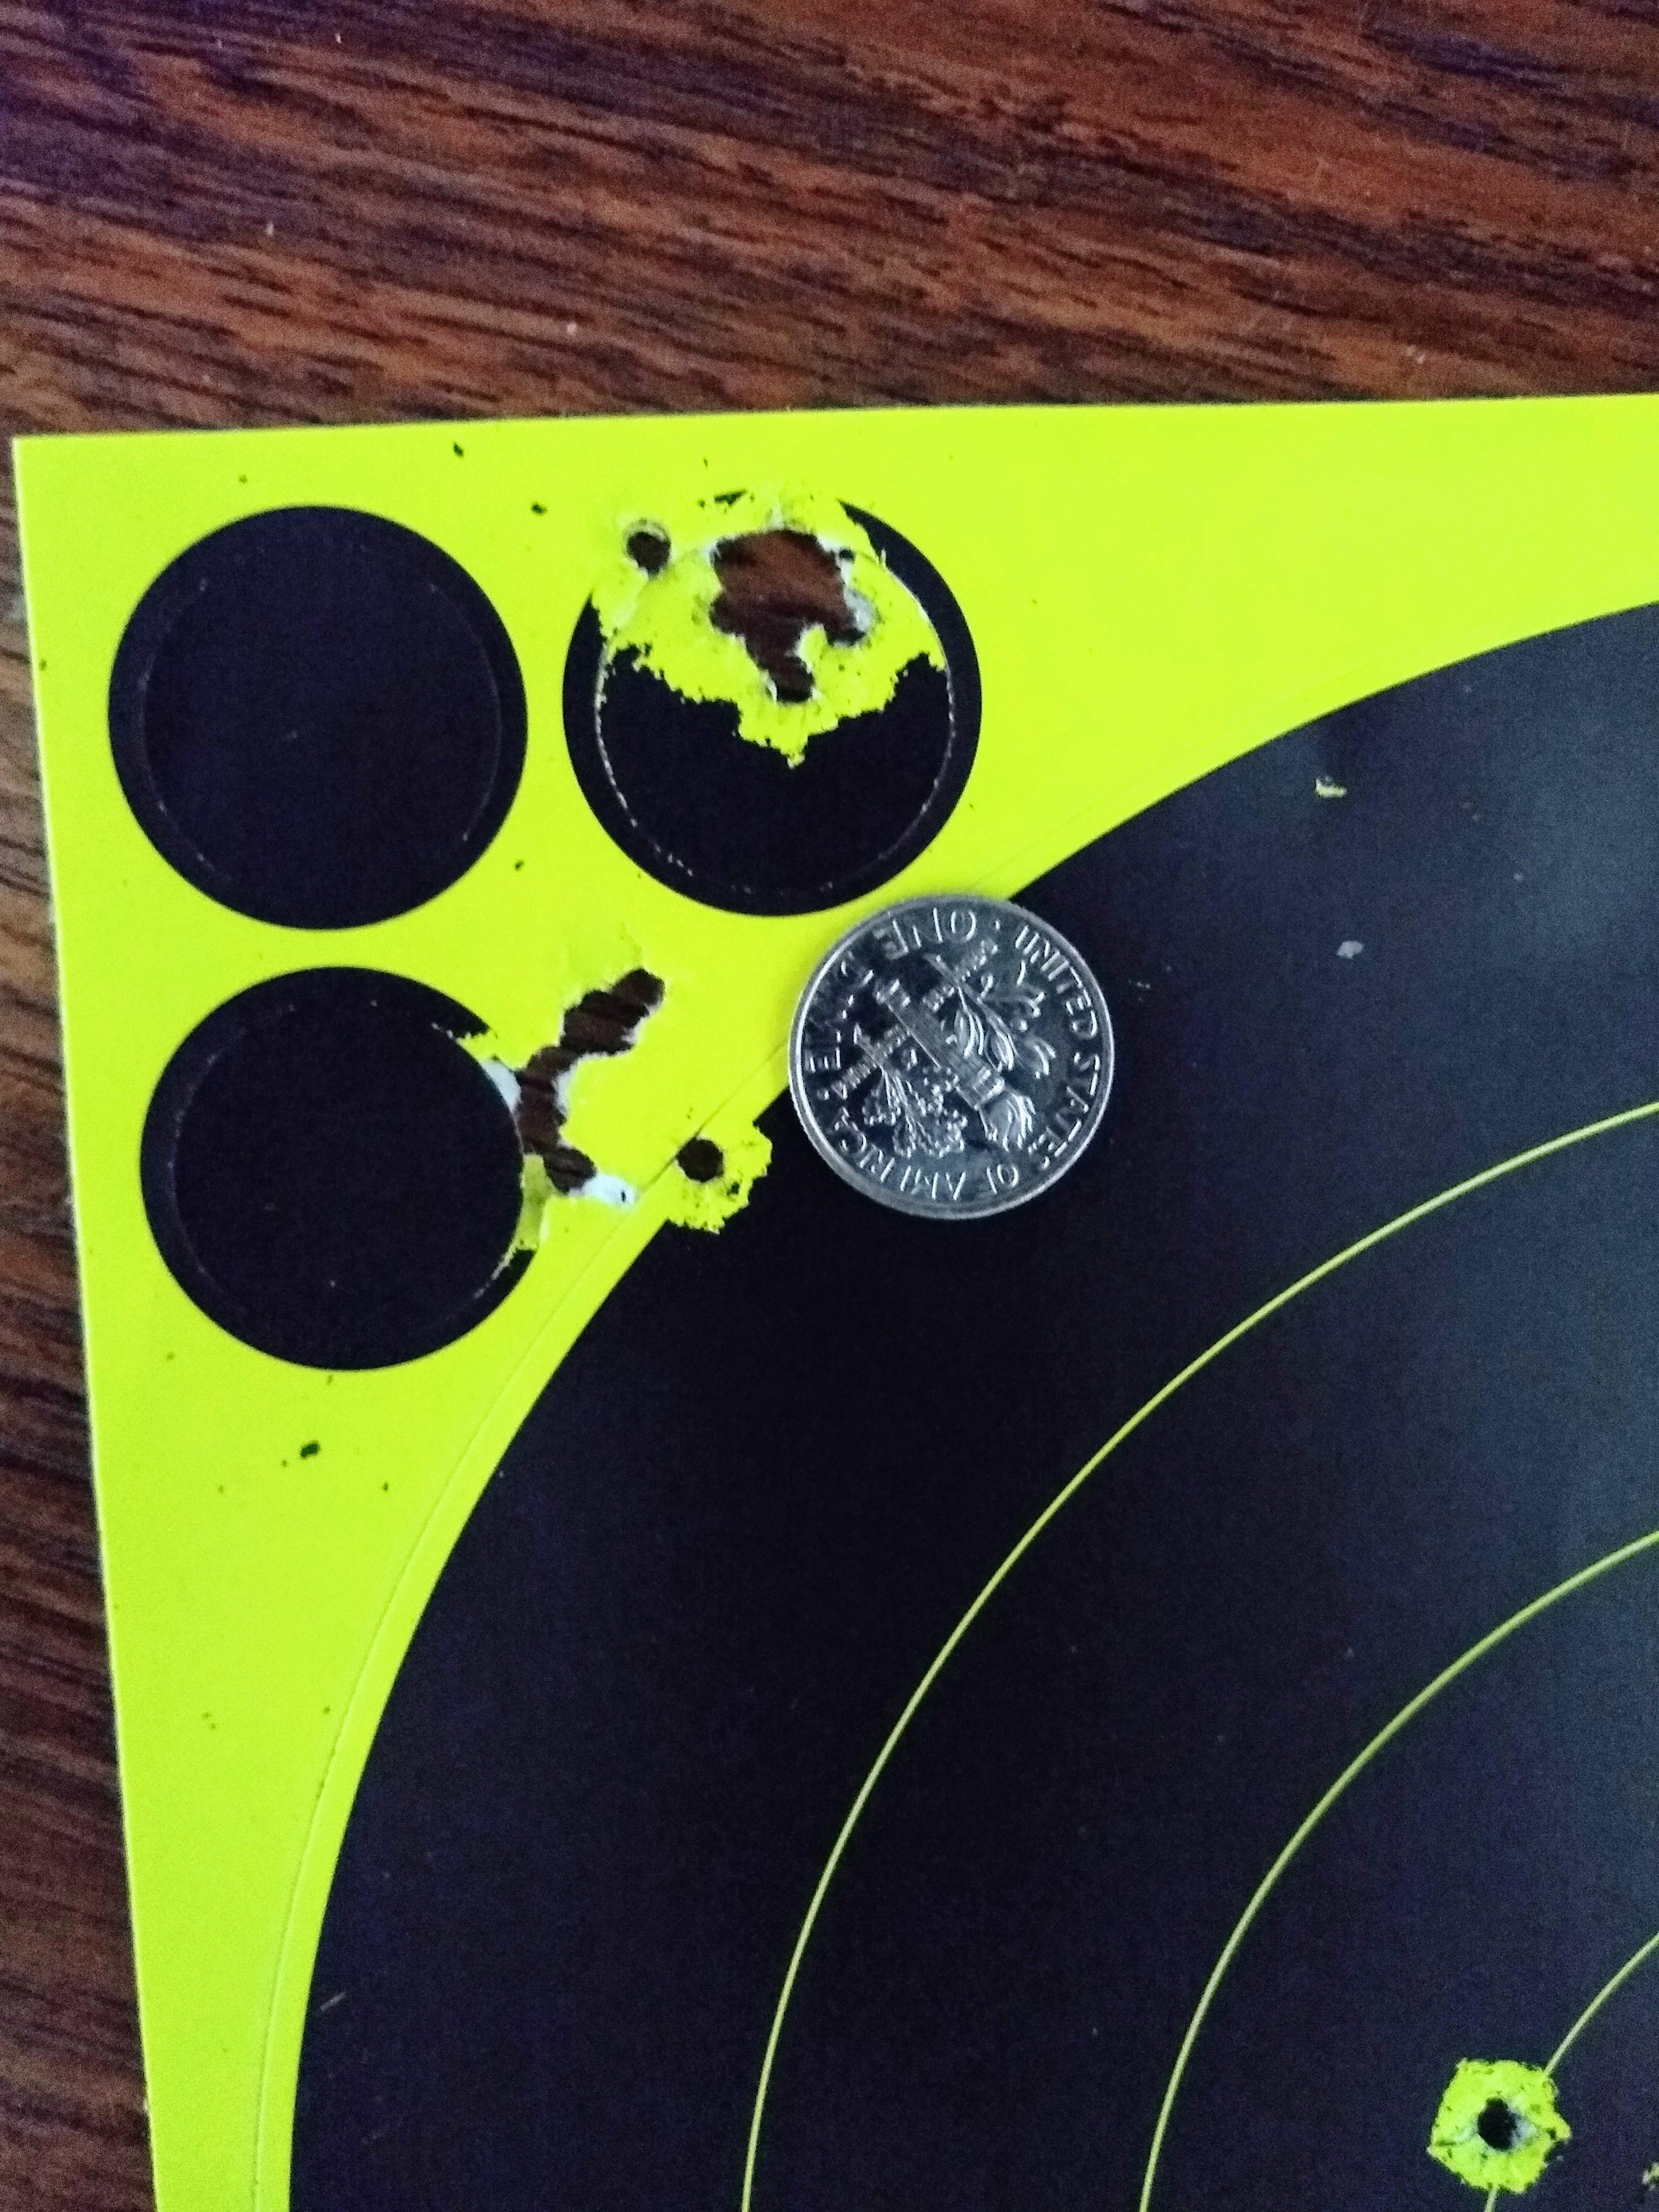 At last!! Pellets and slugs! - Airguns & Guns Forum